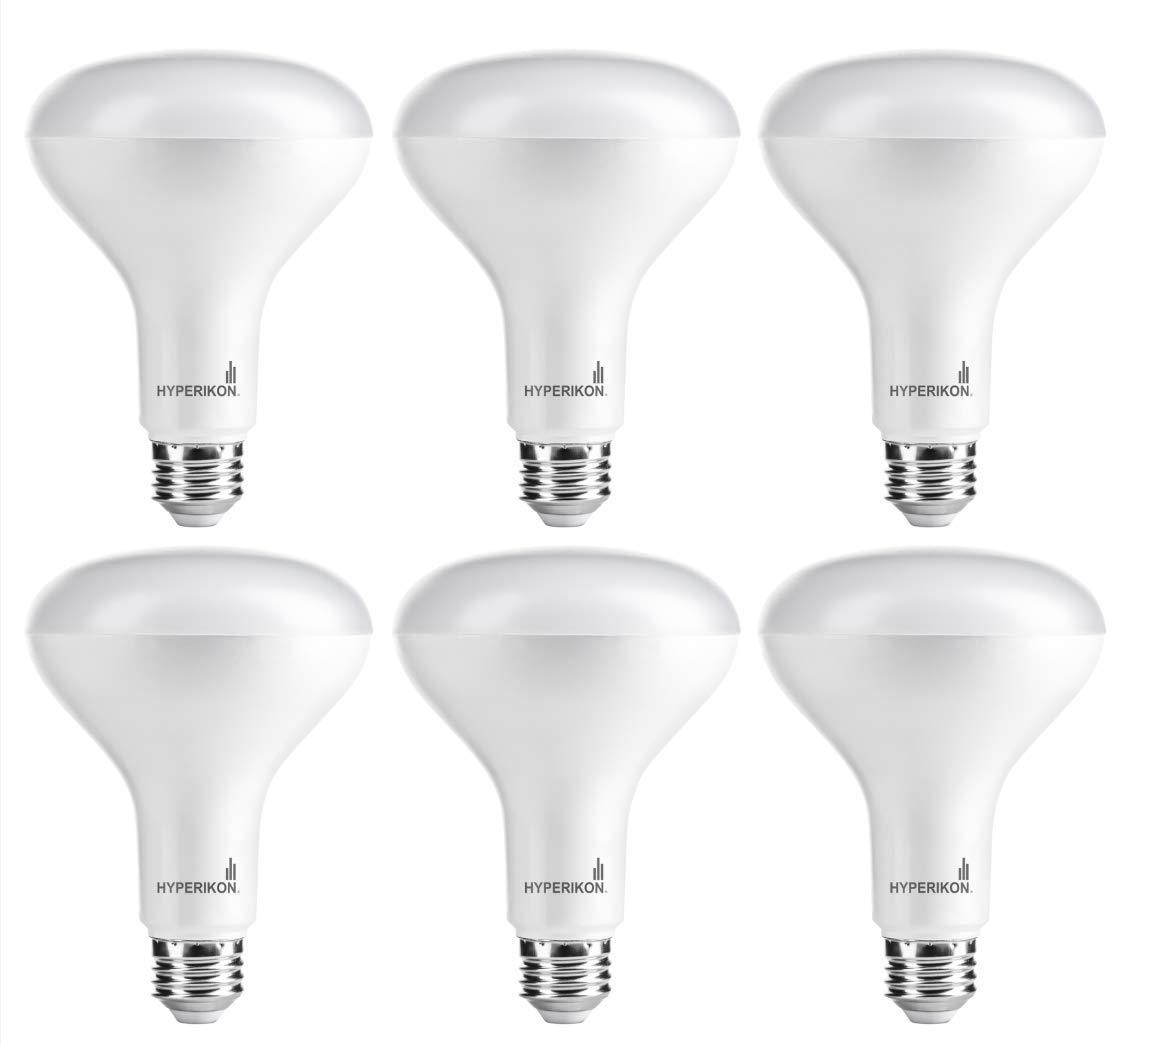 Hyperikon BR30 LED Bulb Dimmable, 9W (65W Equivalent), 2700K (Warm White), Wide Flood Light Bulb, Medium Base E26, UL & Energy Star - Great for Living Room, Bedroom, Patio (6 Pack)